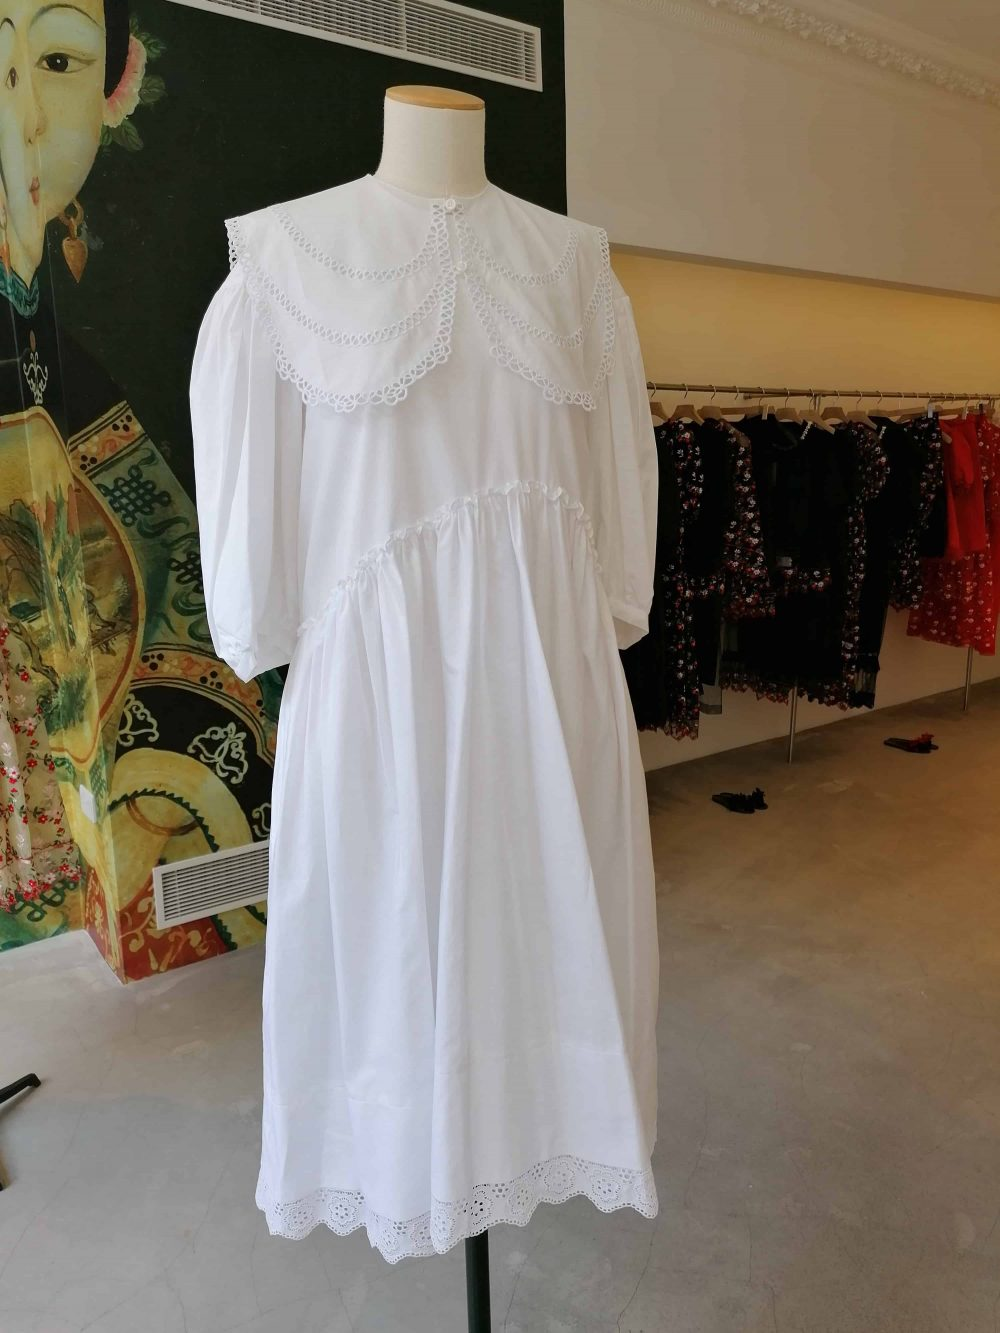 dress by fashion design Simone Rocha, shop on Mount Street, Mayfair, Latest in Design Tour, Fashion Tours London